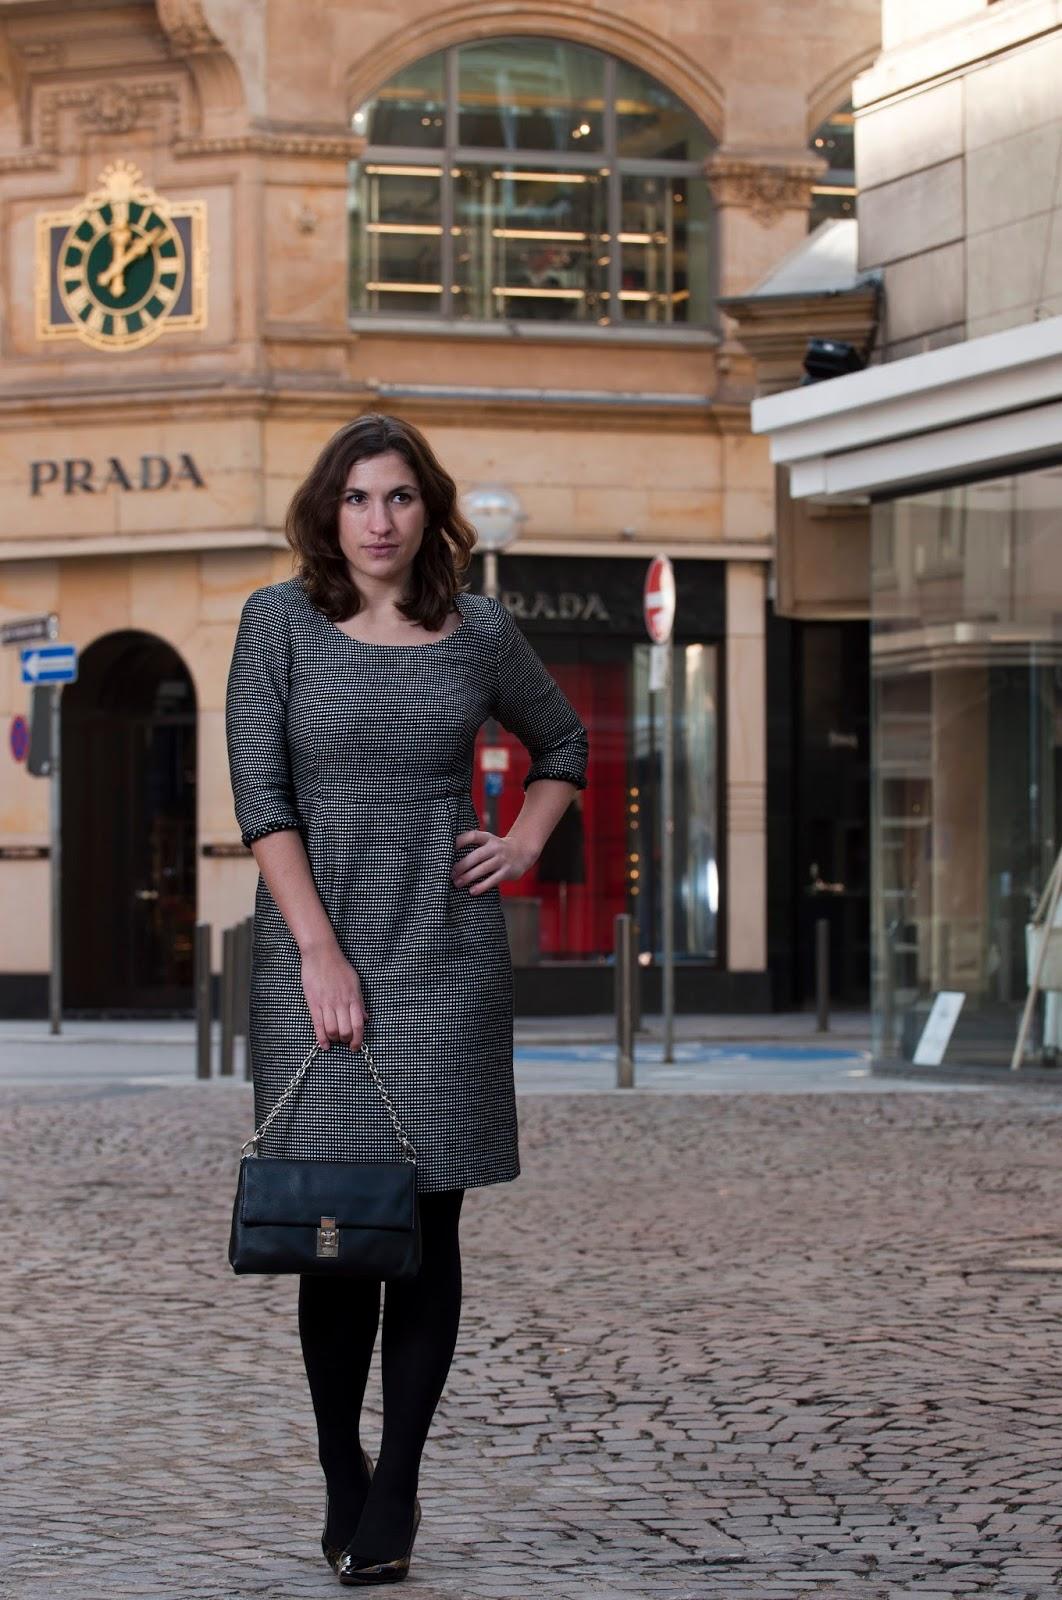 Chanel Kleid nach Burda Style Schnittmuster #122 11/2012